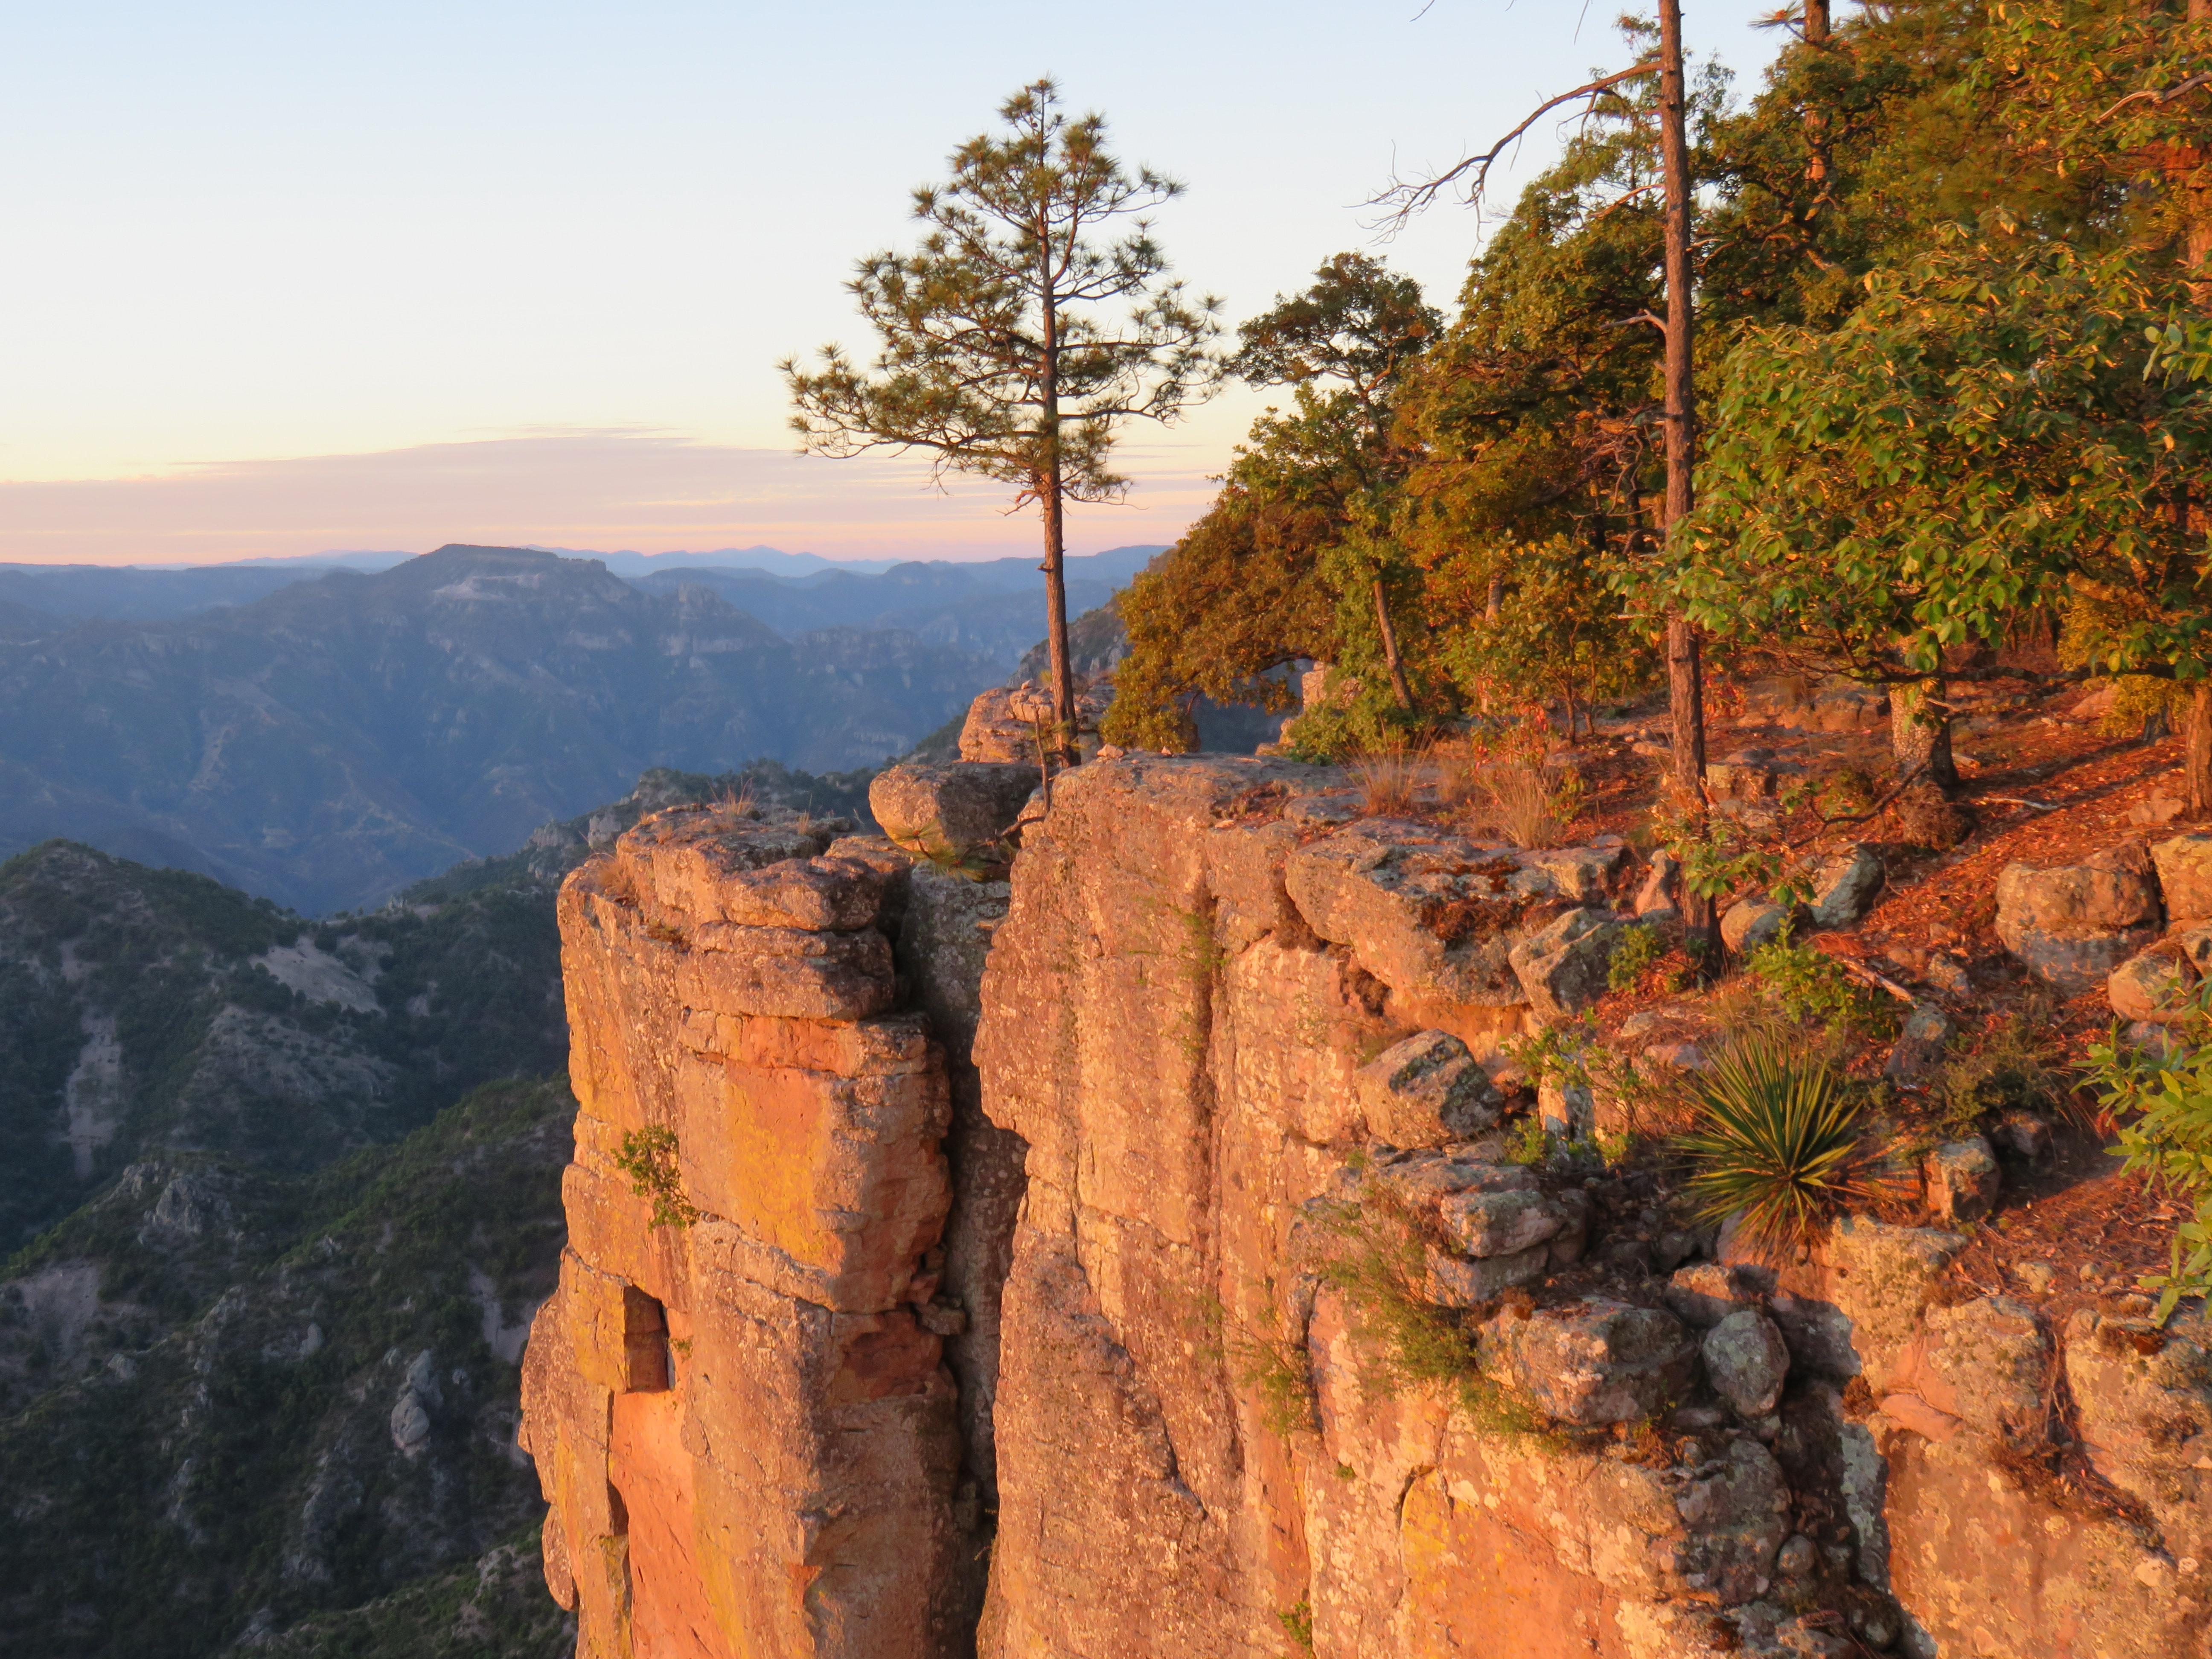 Copper Canyon Photo by Sandra Dempsey